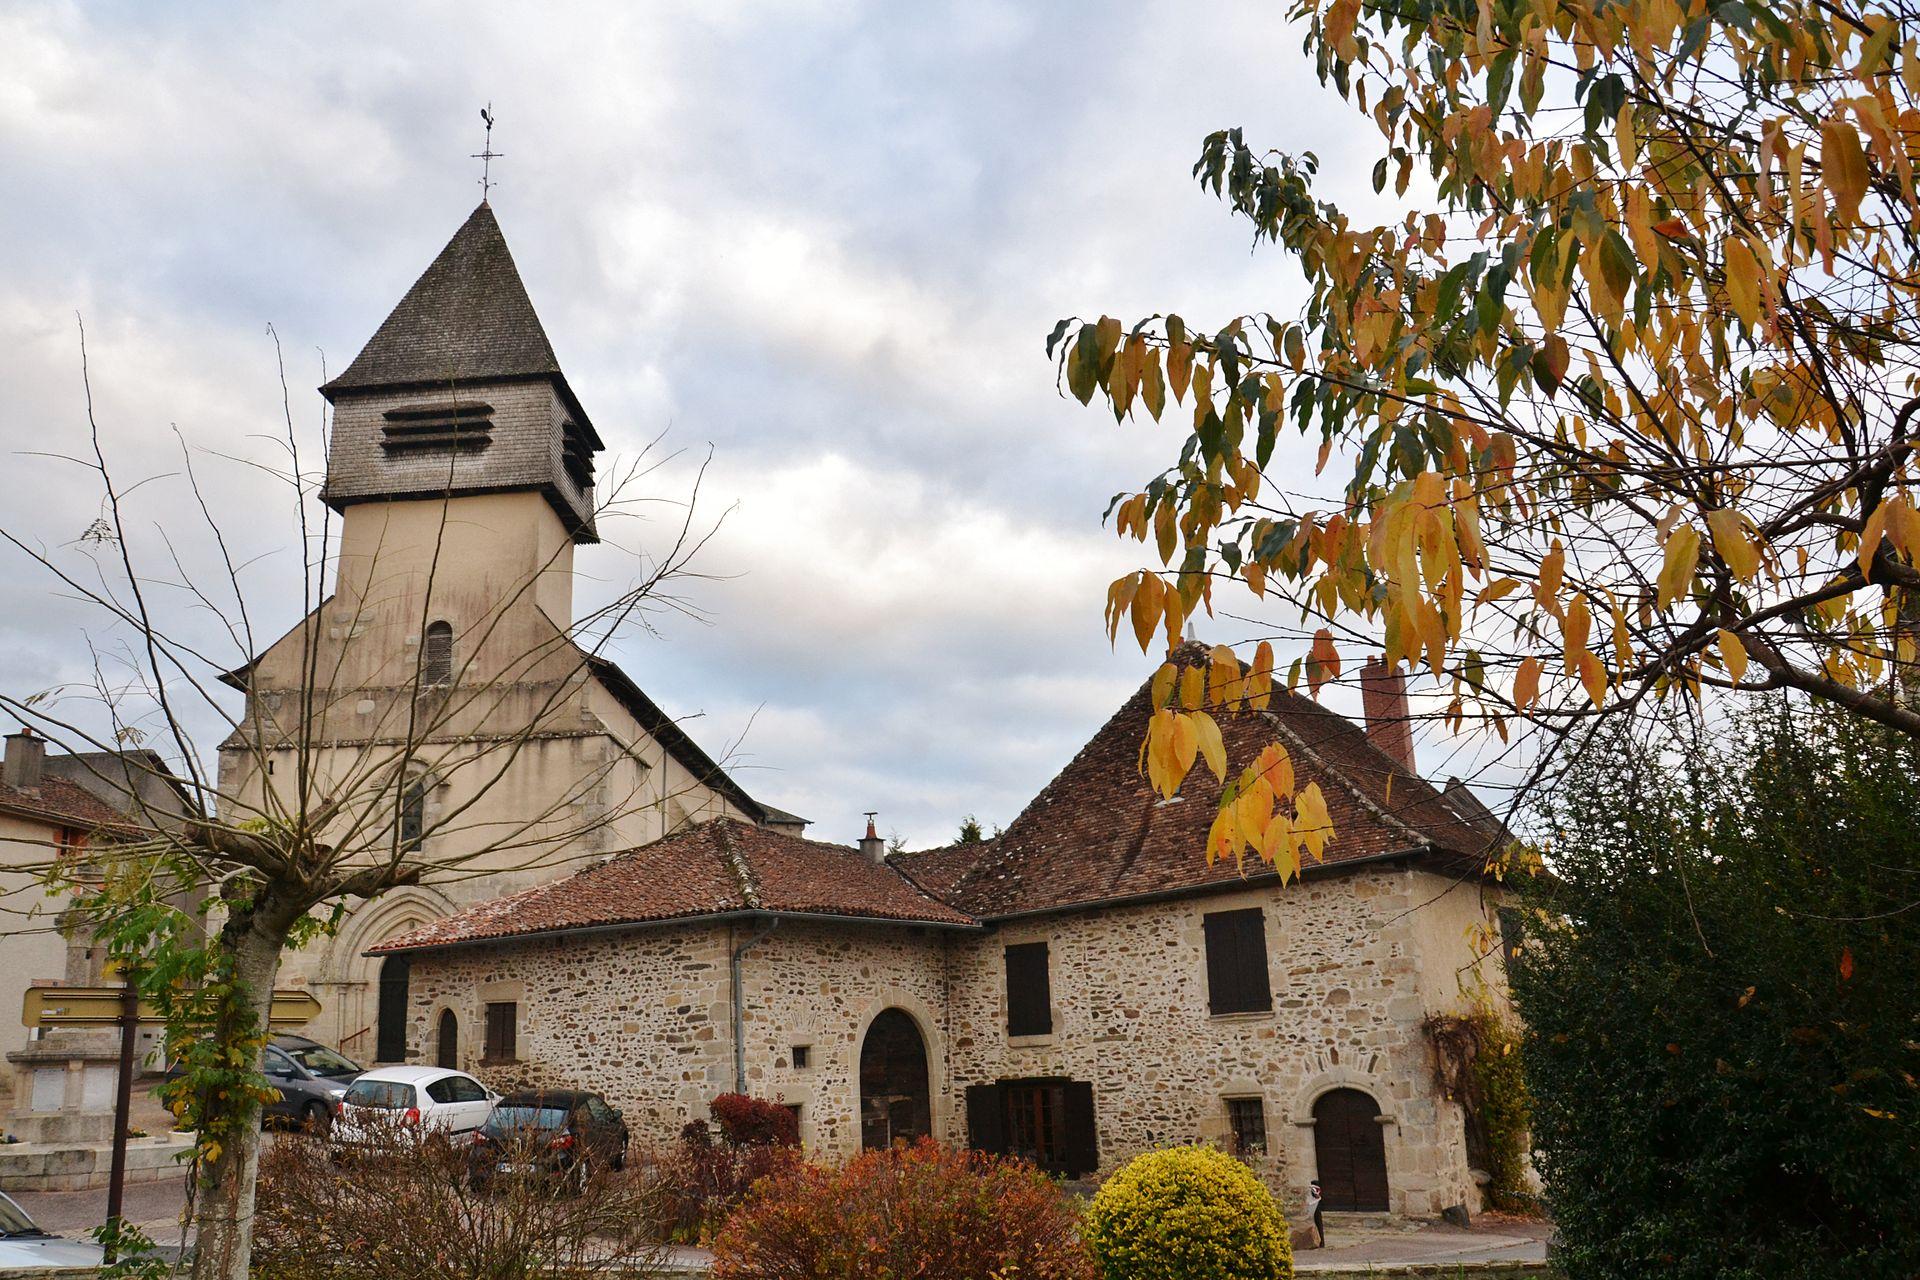 Saint paul haute vienne wikip dia for Haute vienne code postal